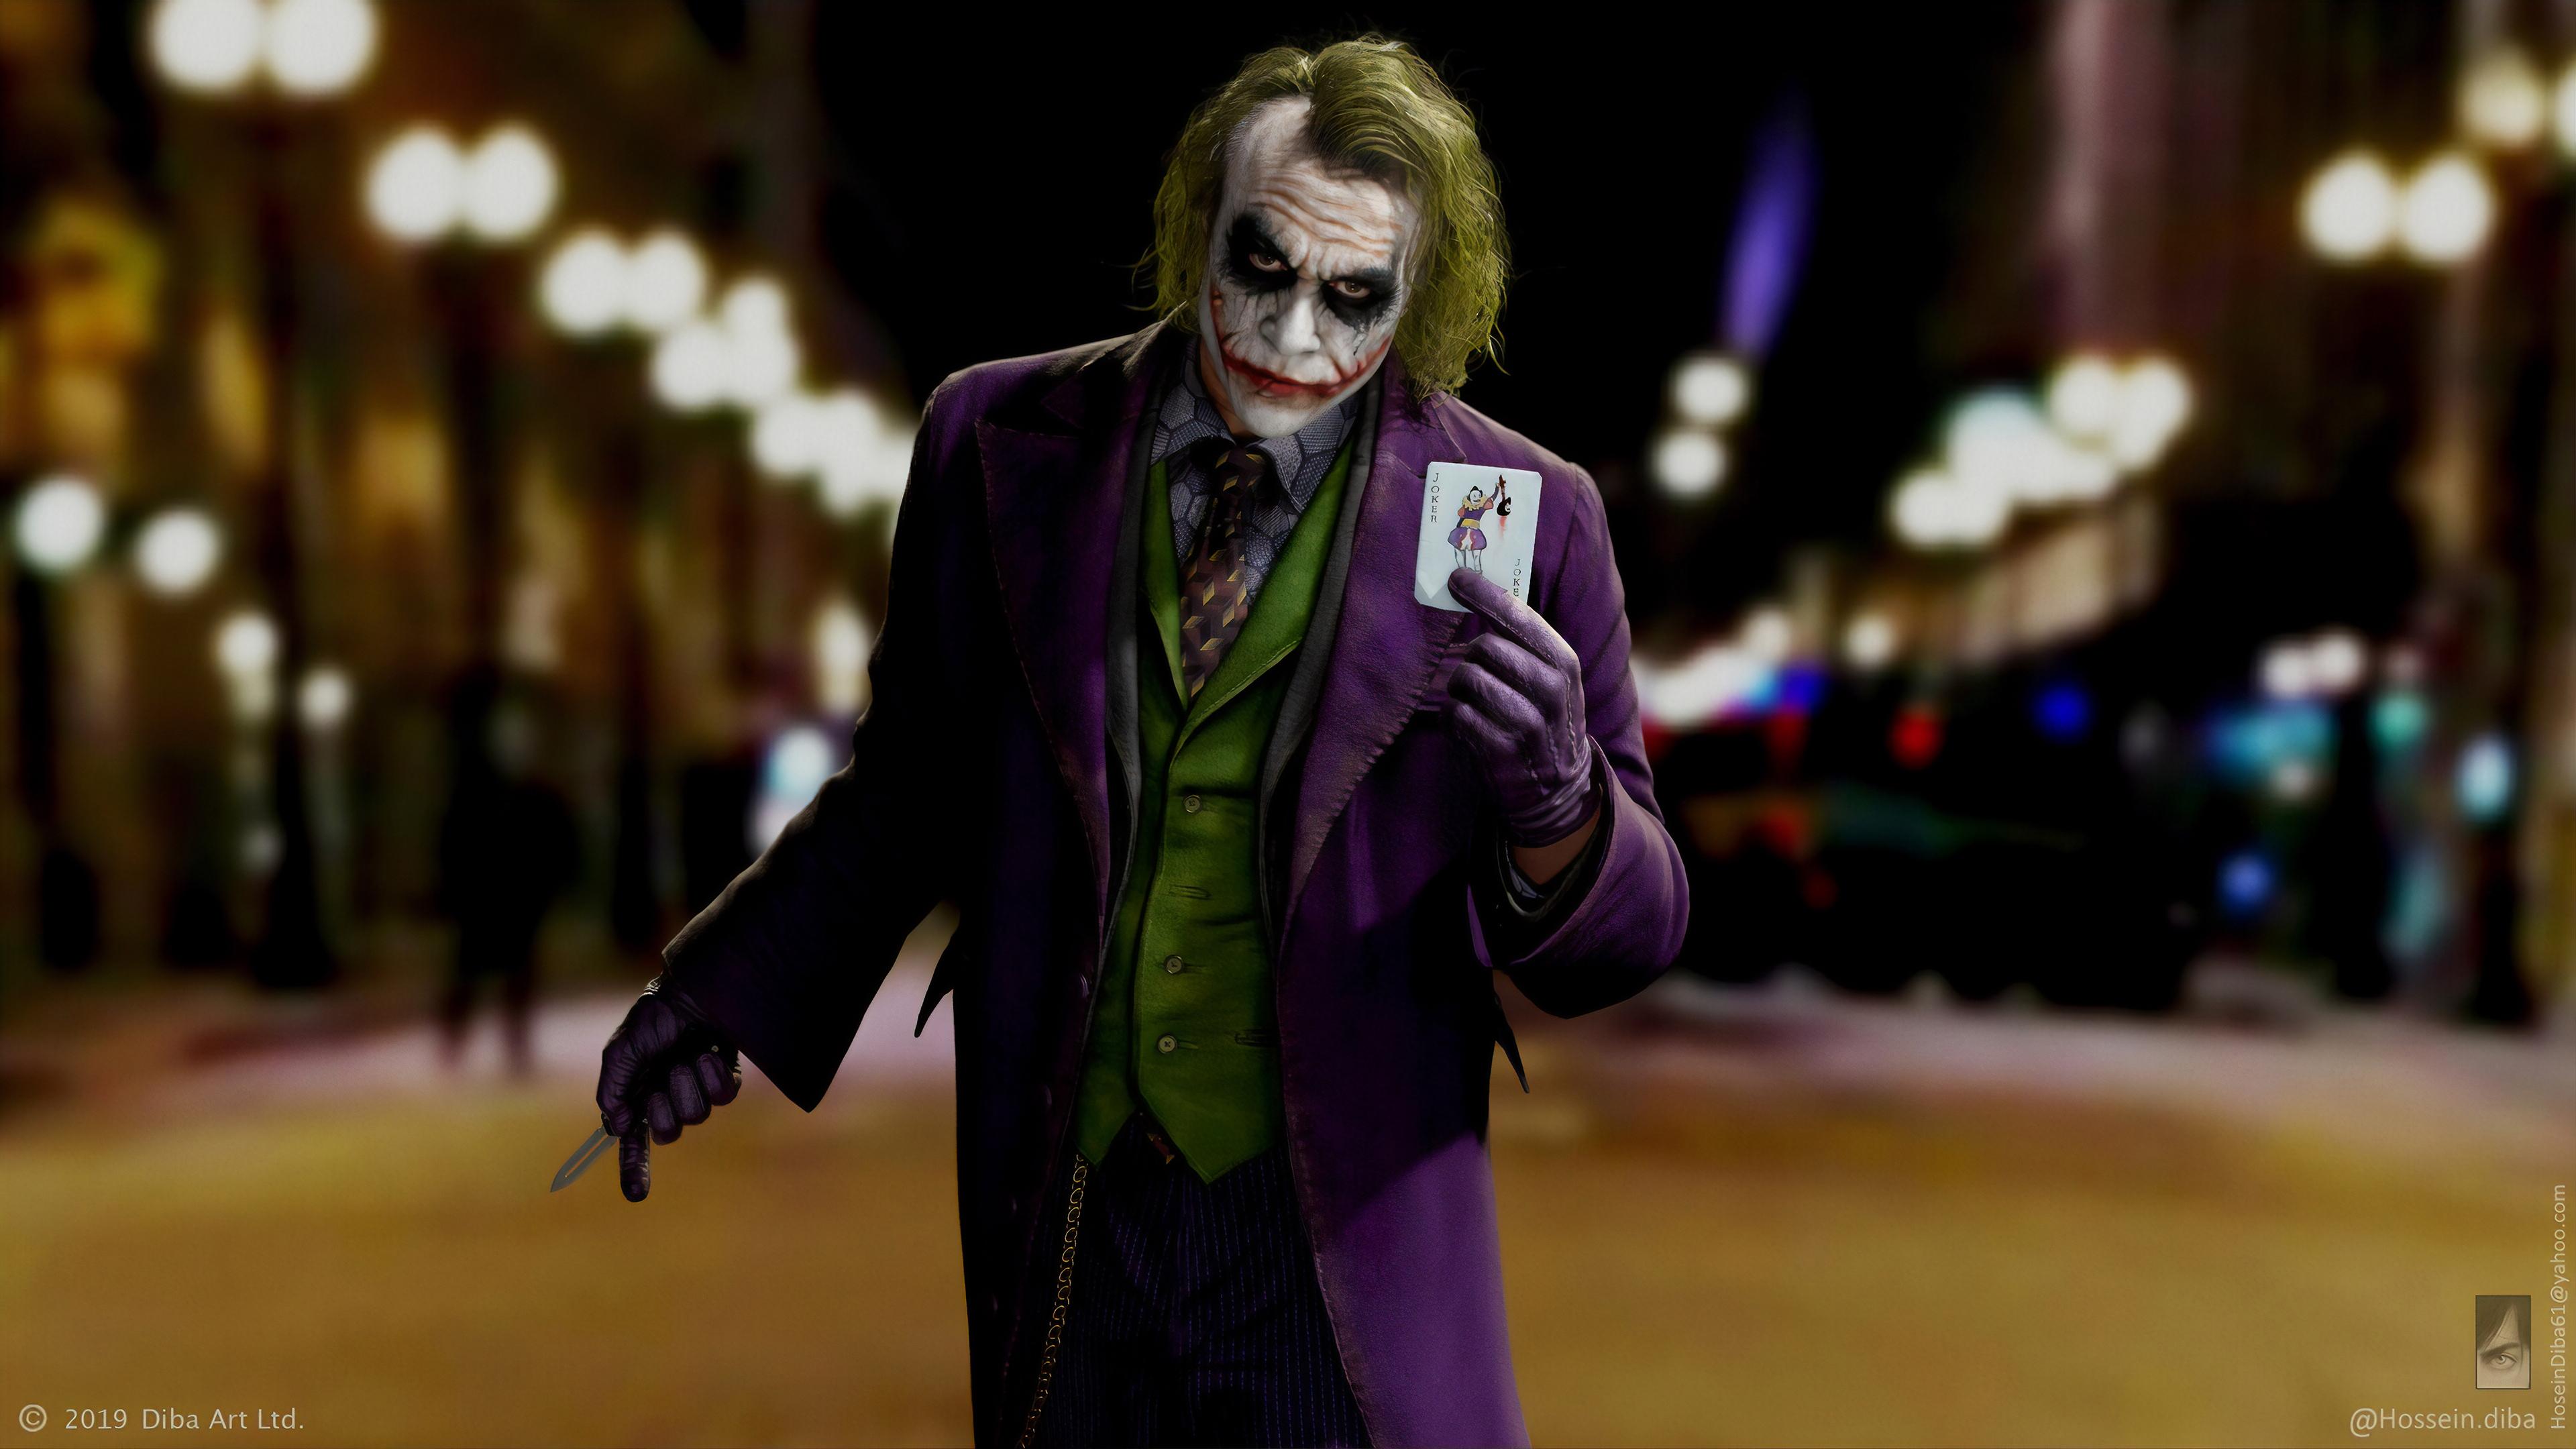 joker heath ledger flip it 1565054218 - Joker Heath Ledger Flip It - supervillain wallpapers, joker wallpapers, hd-wallpapers, artstation wallpapers, 4k-wallpapers